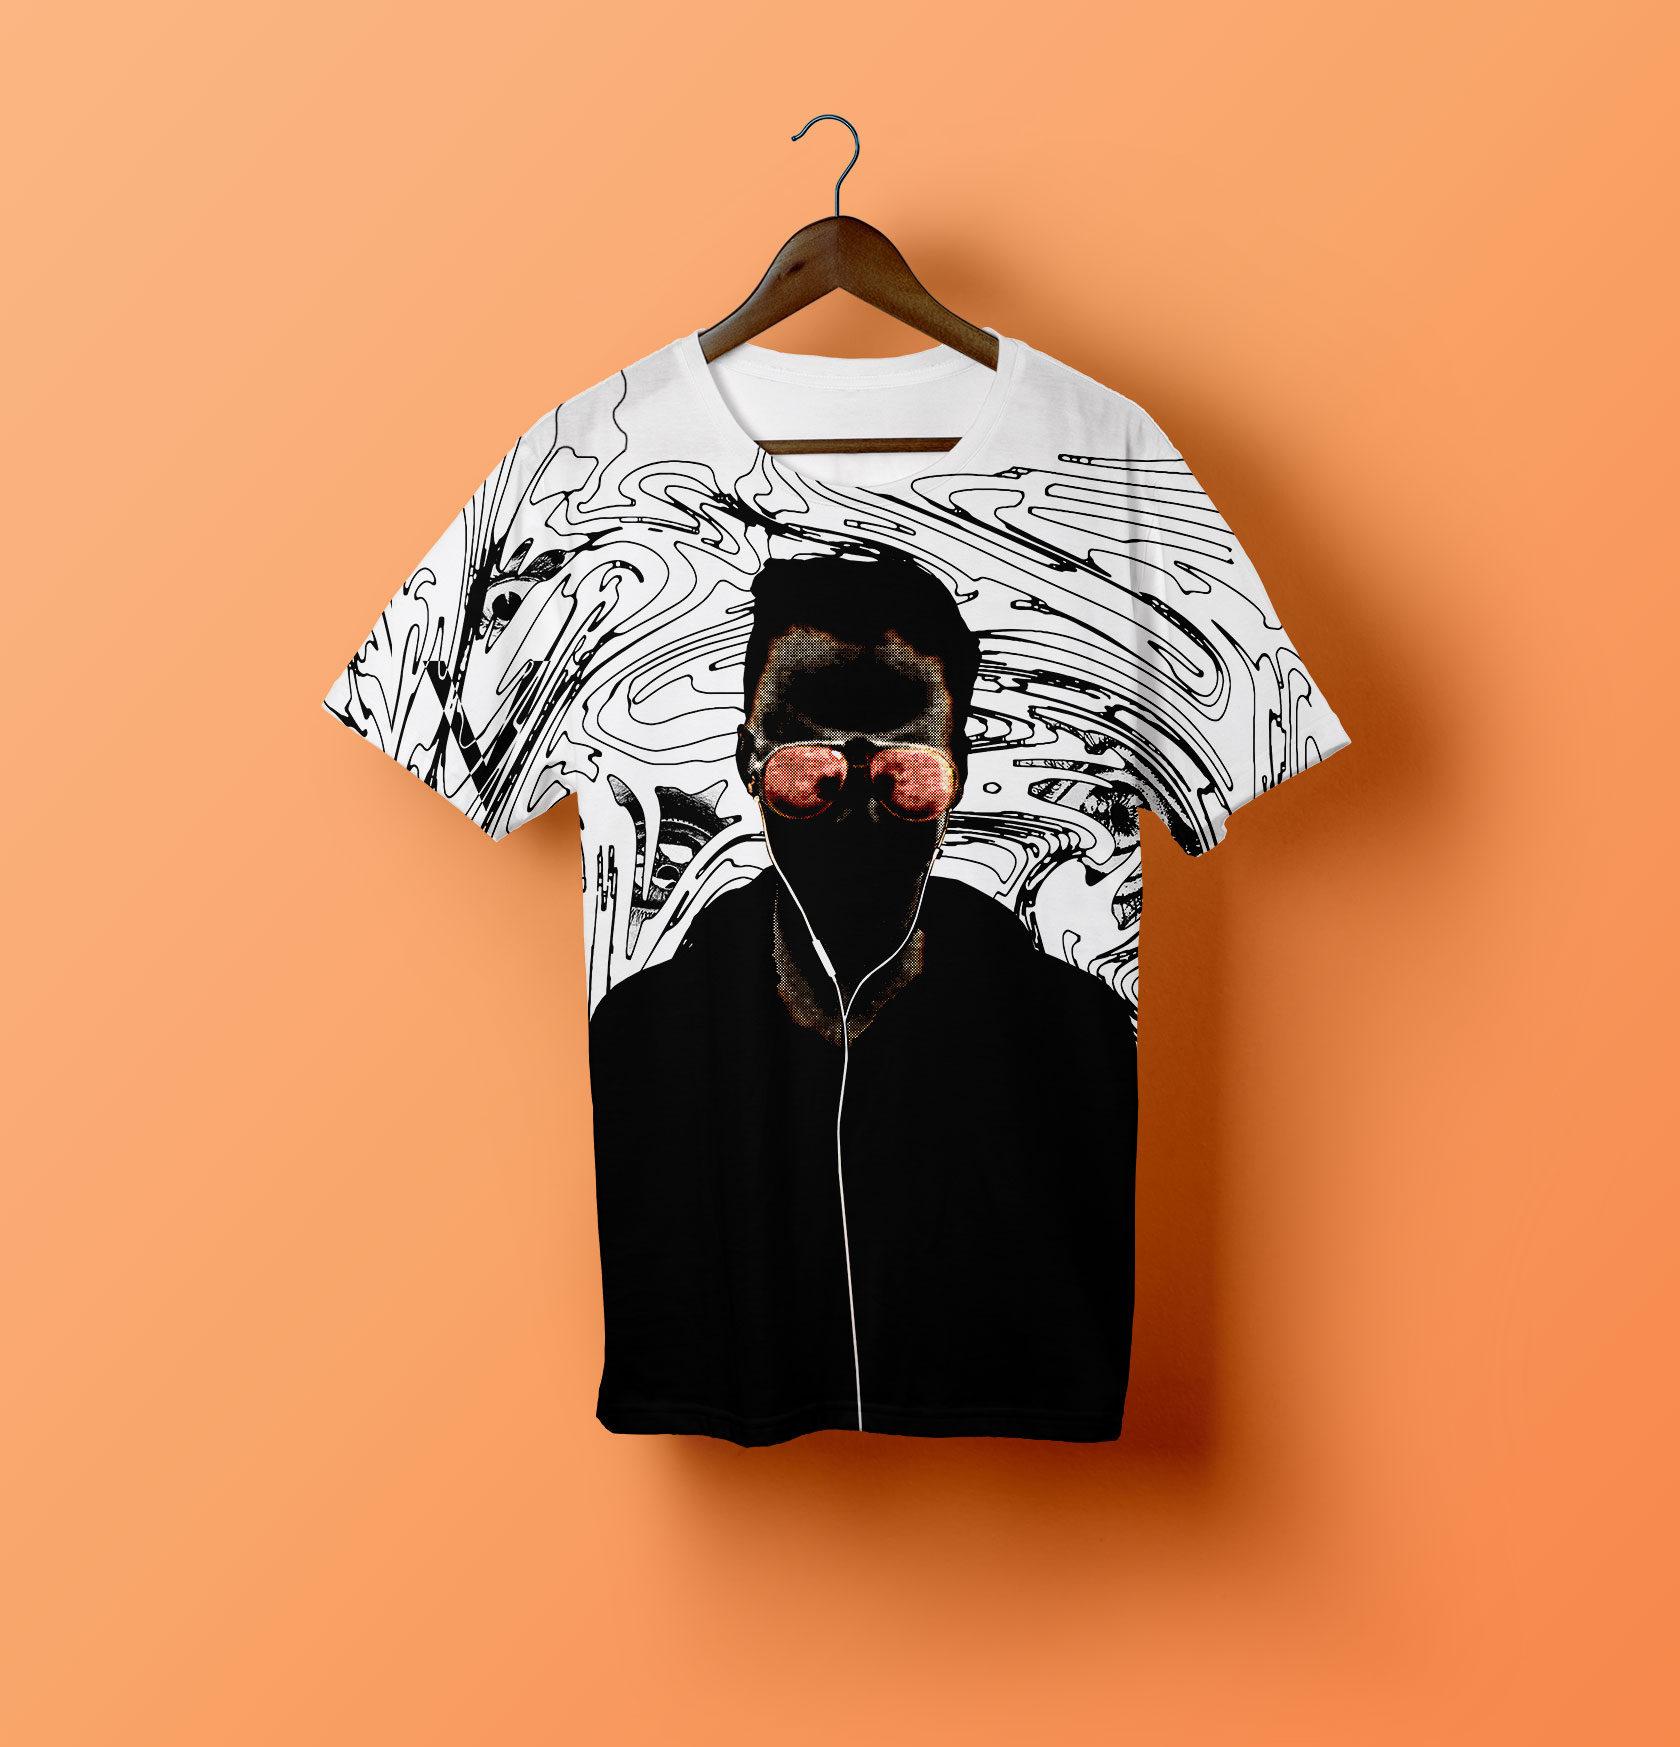 Voyeur Movie Merchandise Tshirt Design by Furia